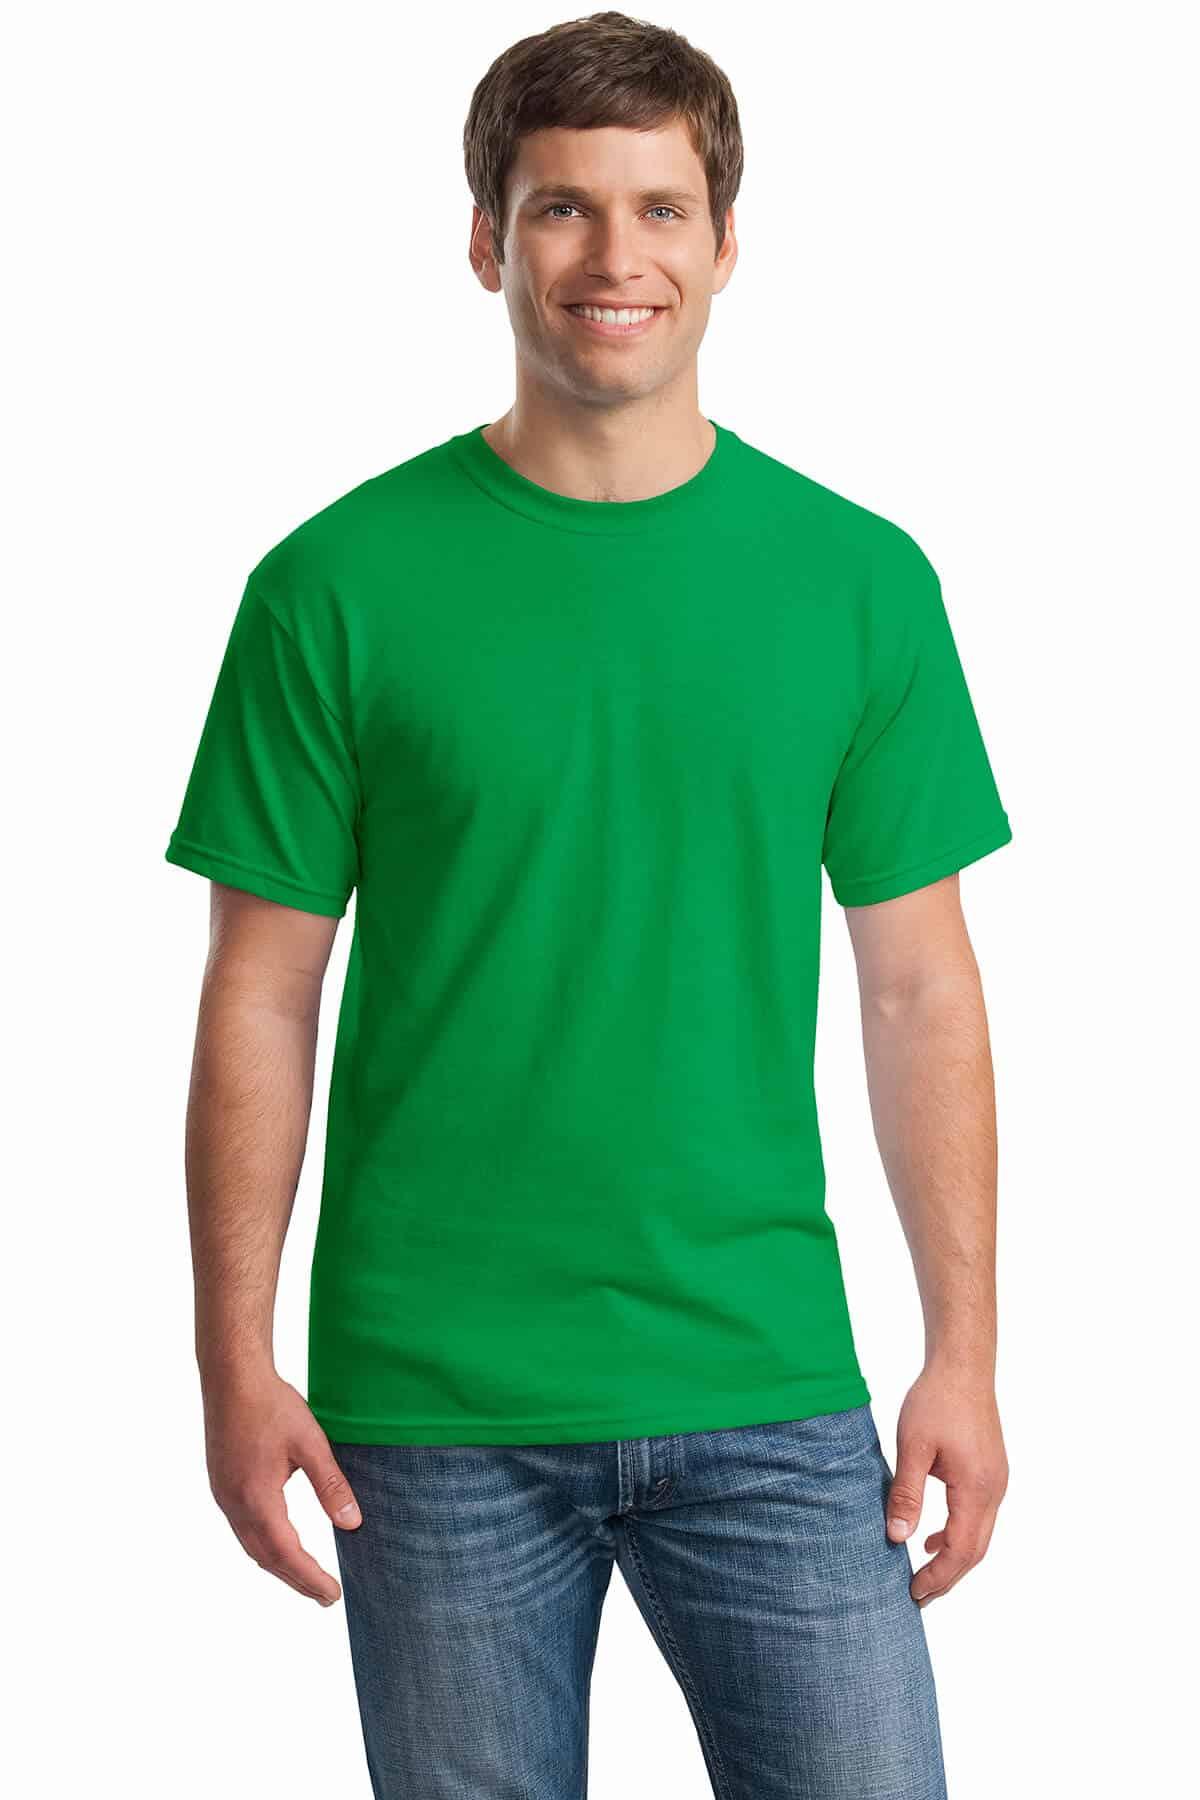 Irish Green Tee Front